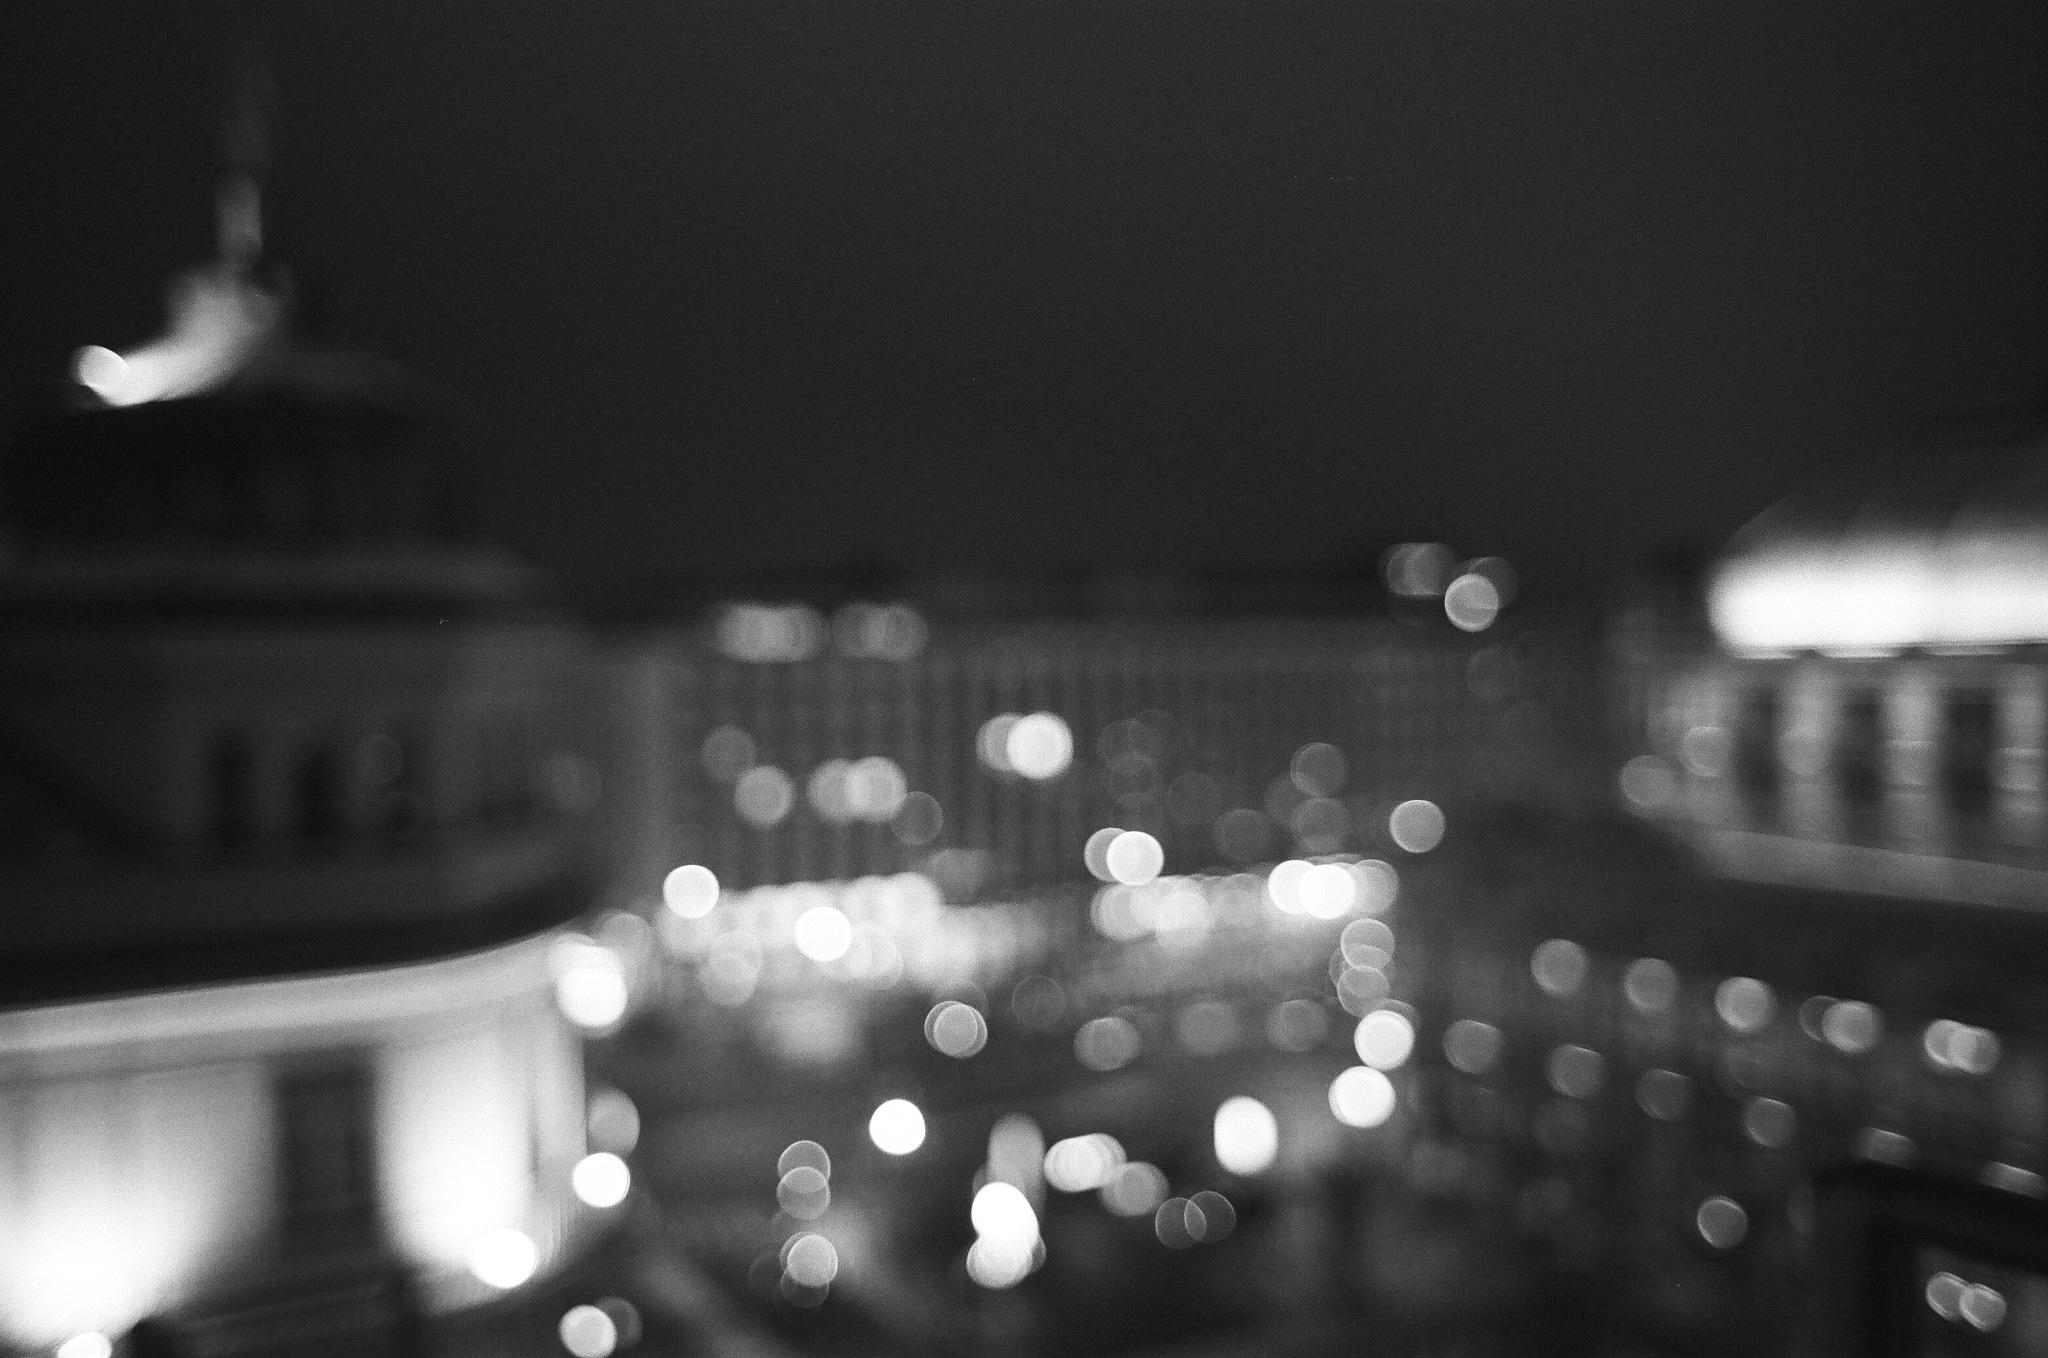 Blurry Lights by Georg Prenn